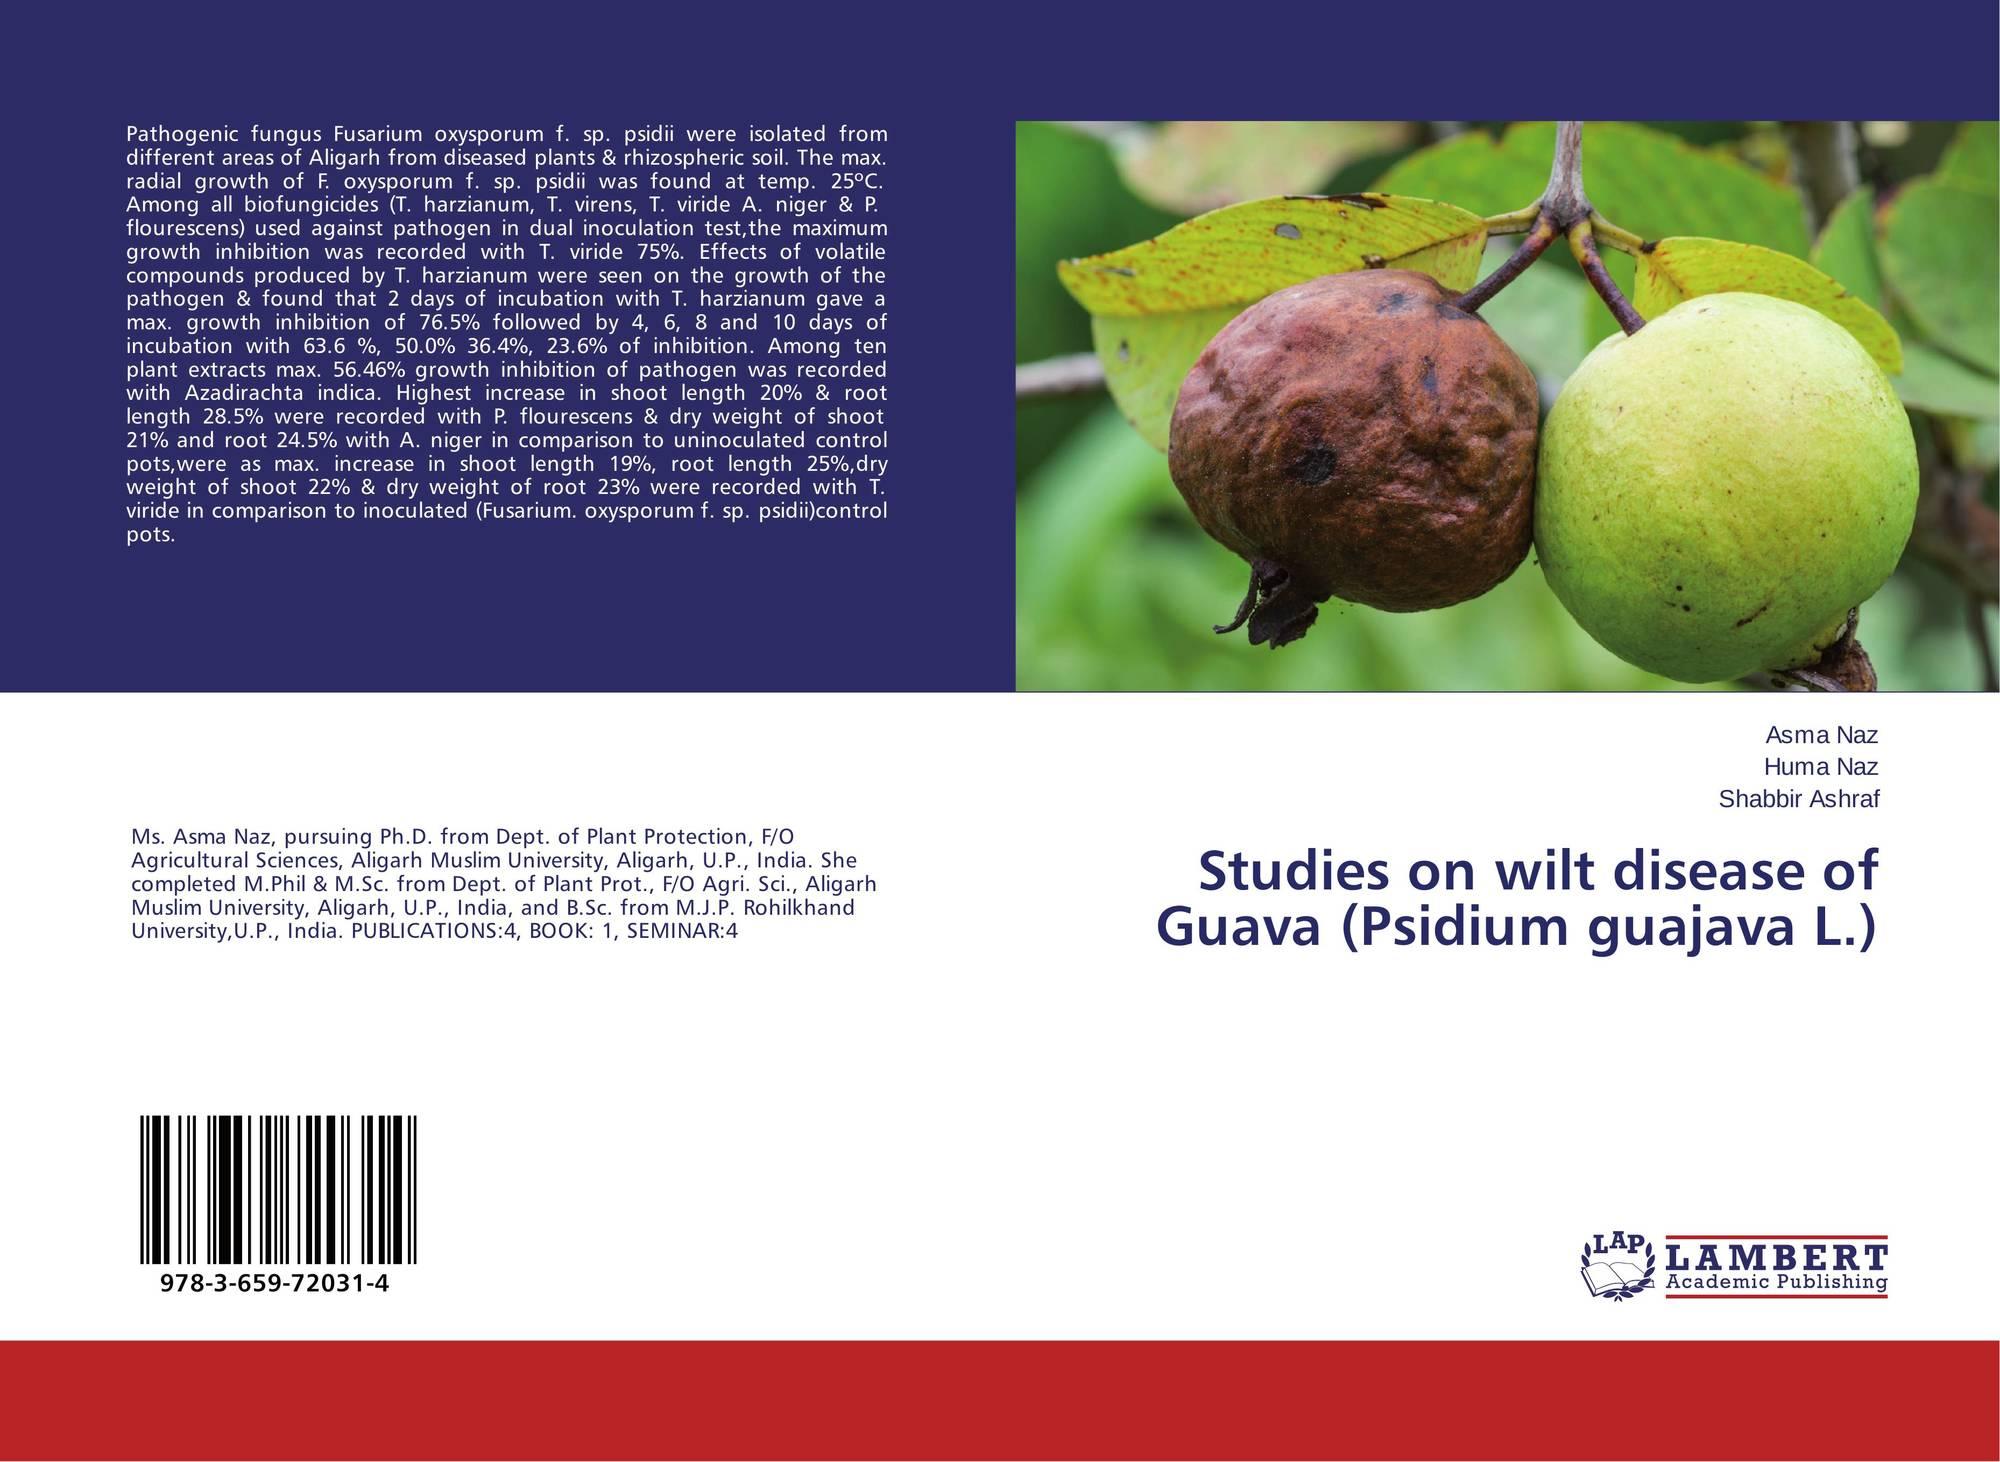 microbial property of psidium guavaja and Full-text paper (pdf): antifungal activity of psidium guajava organic extracts against dermatophytic fungi.